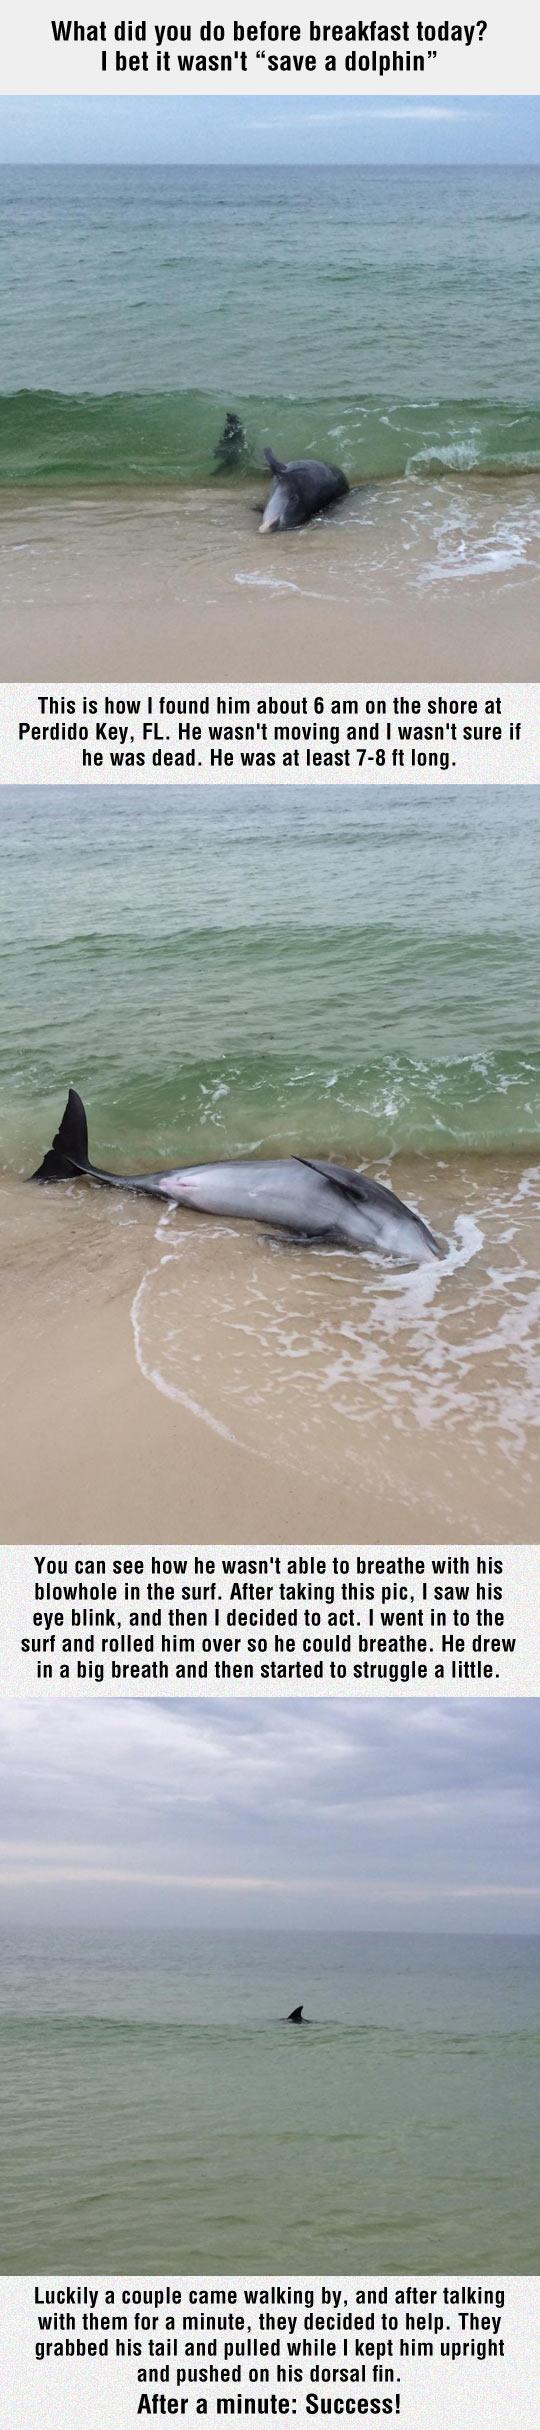 cool-dolphin-beach-saving-happy